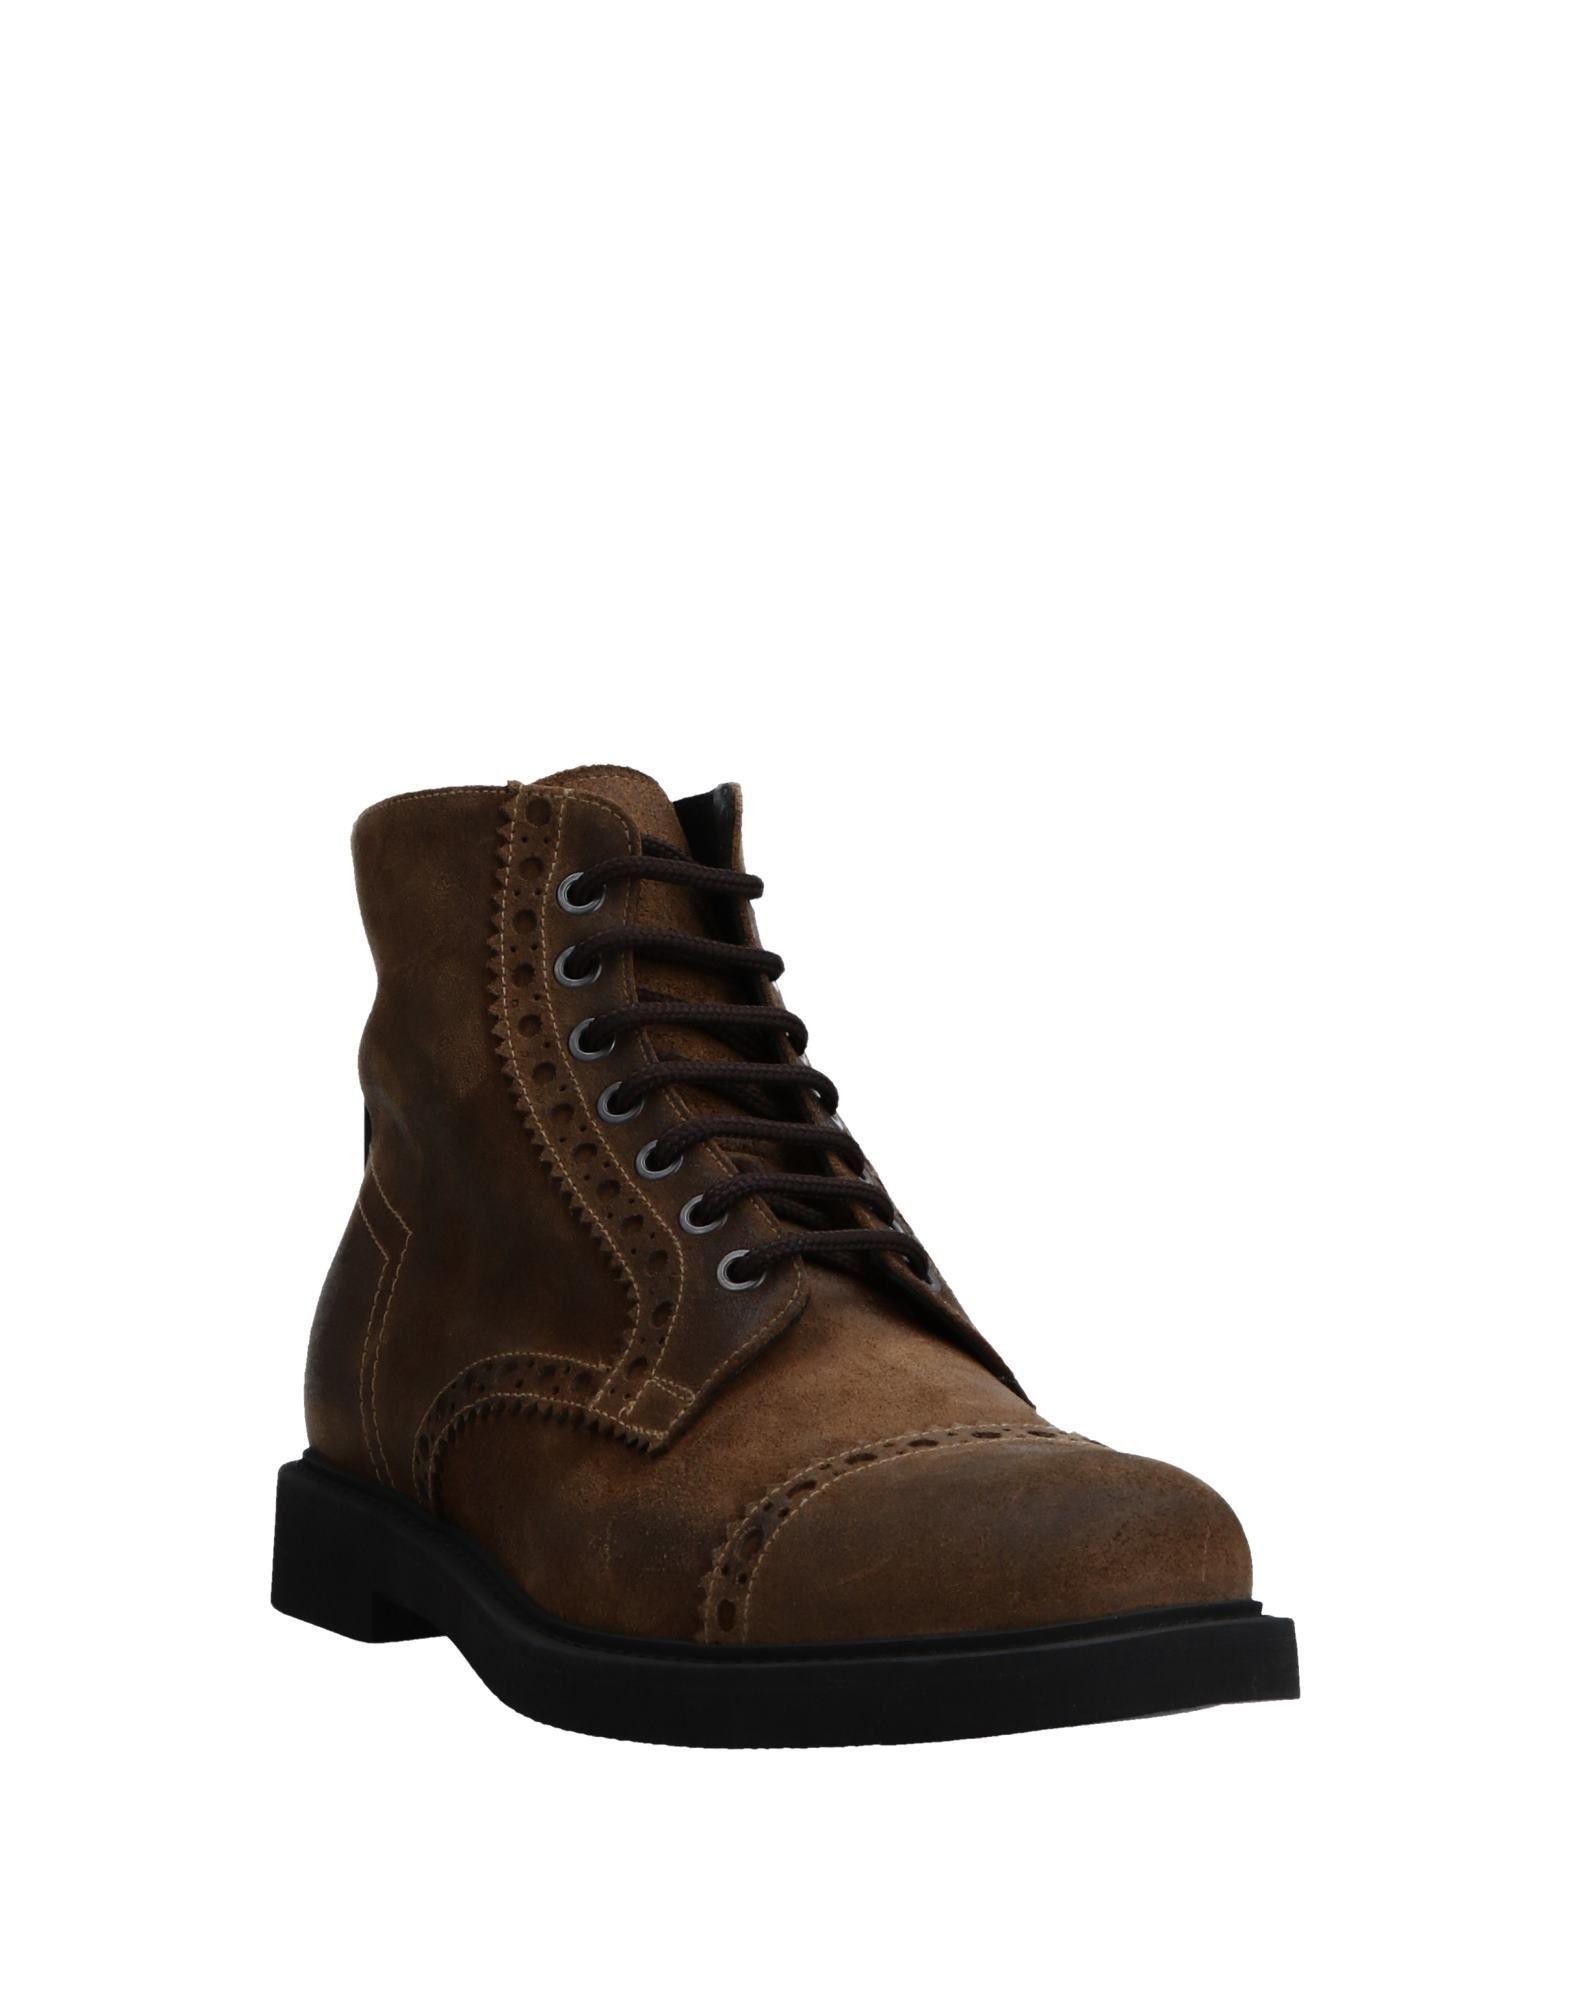 Bruno Bordese Man Ankle boots Khaki Leather